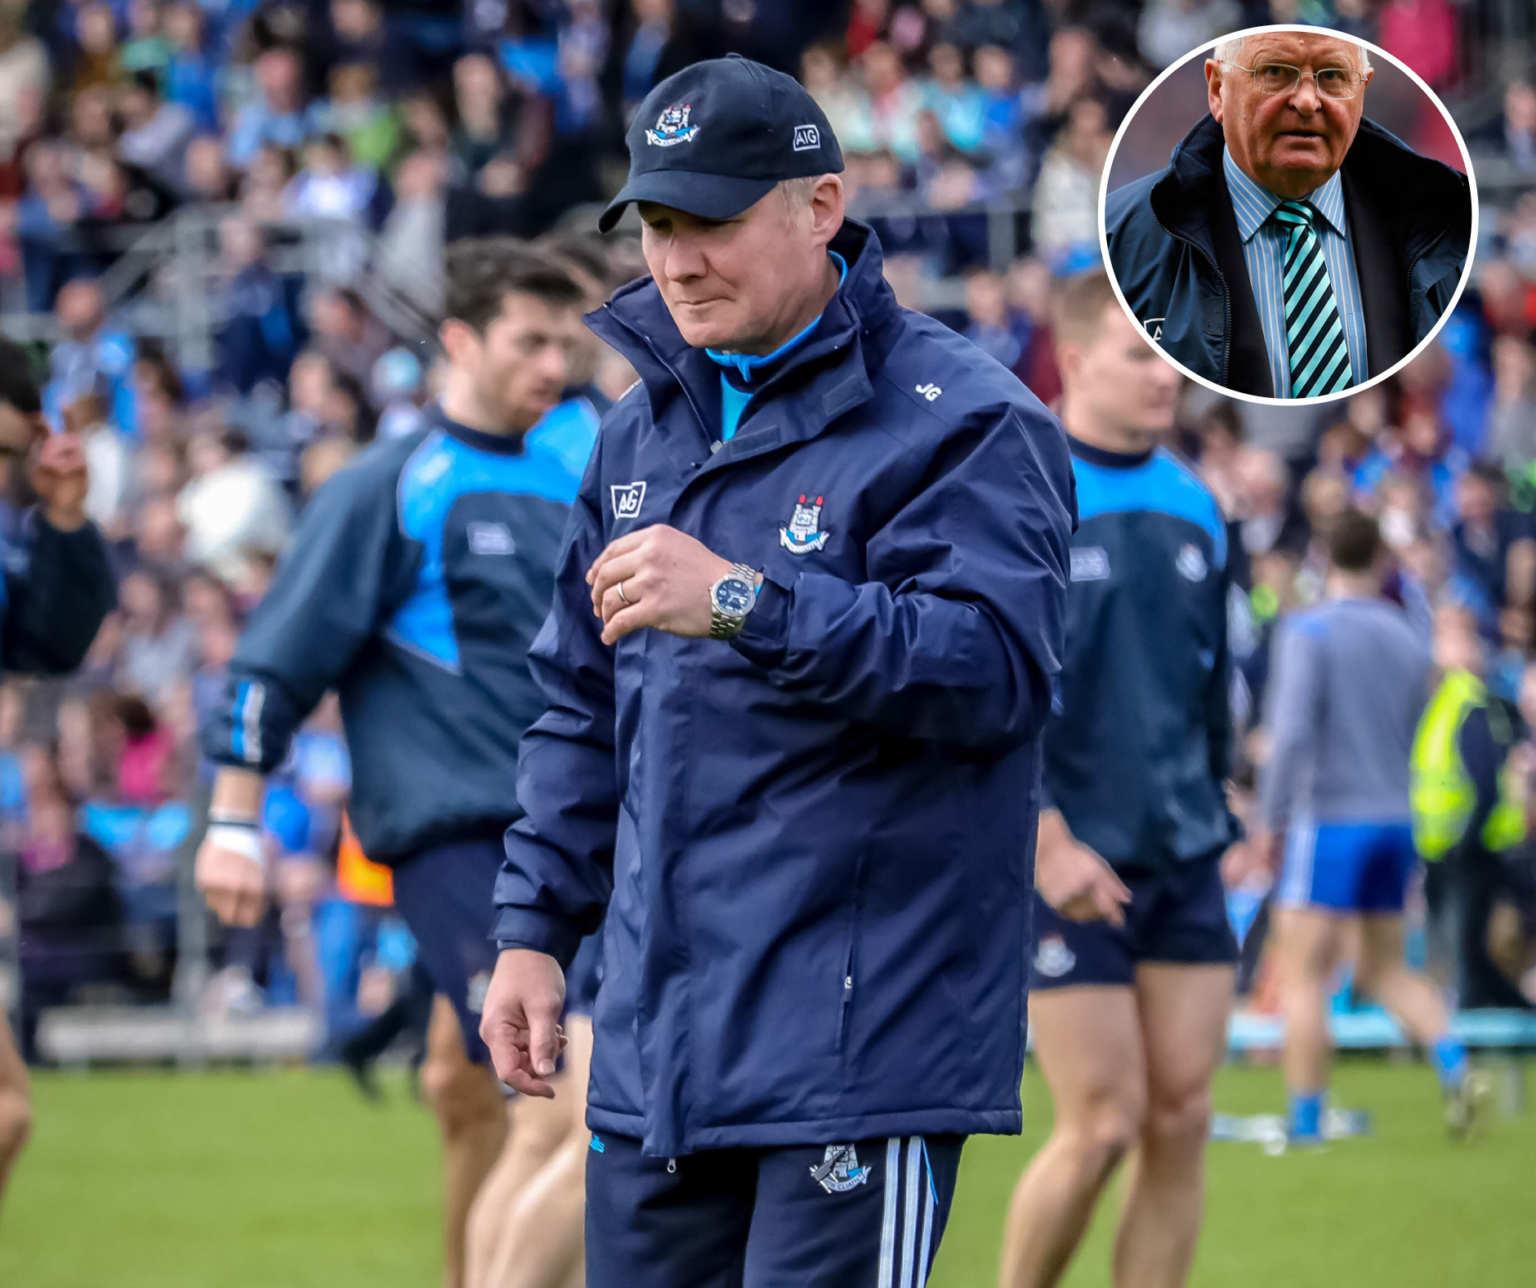 Dublin Chairman Sean Shanley inset was shocked to hear of Jim Gavin departure as Dublin senior manager.